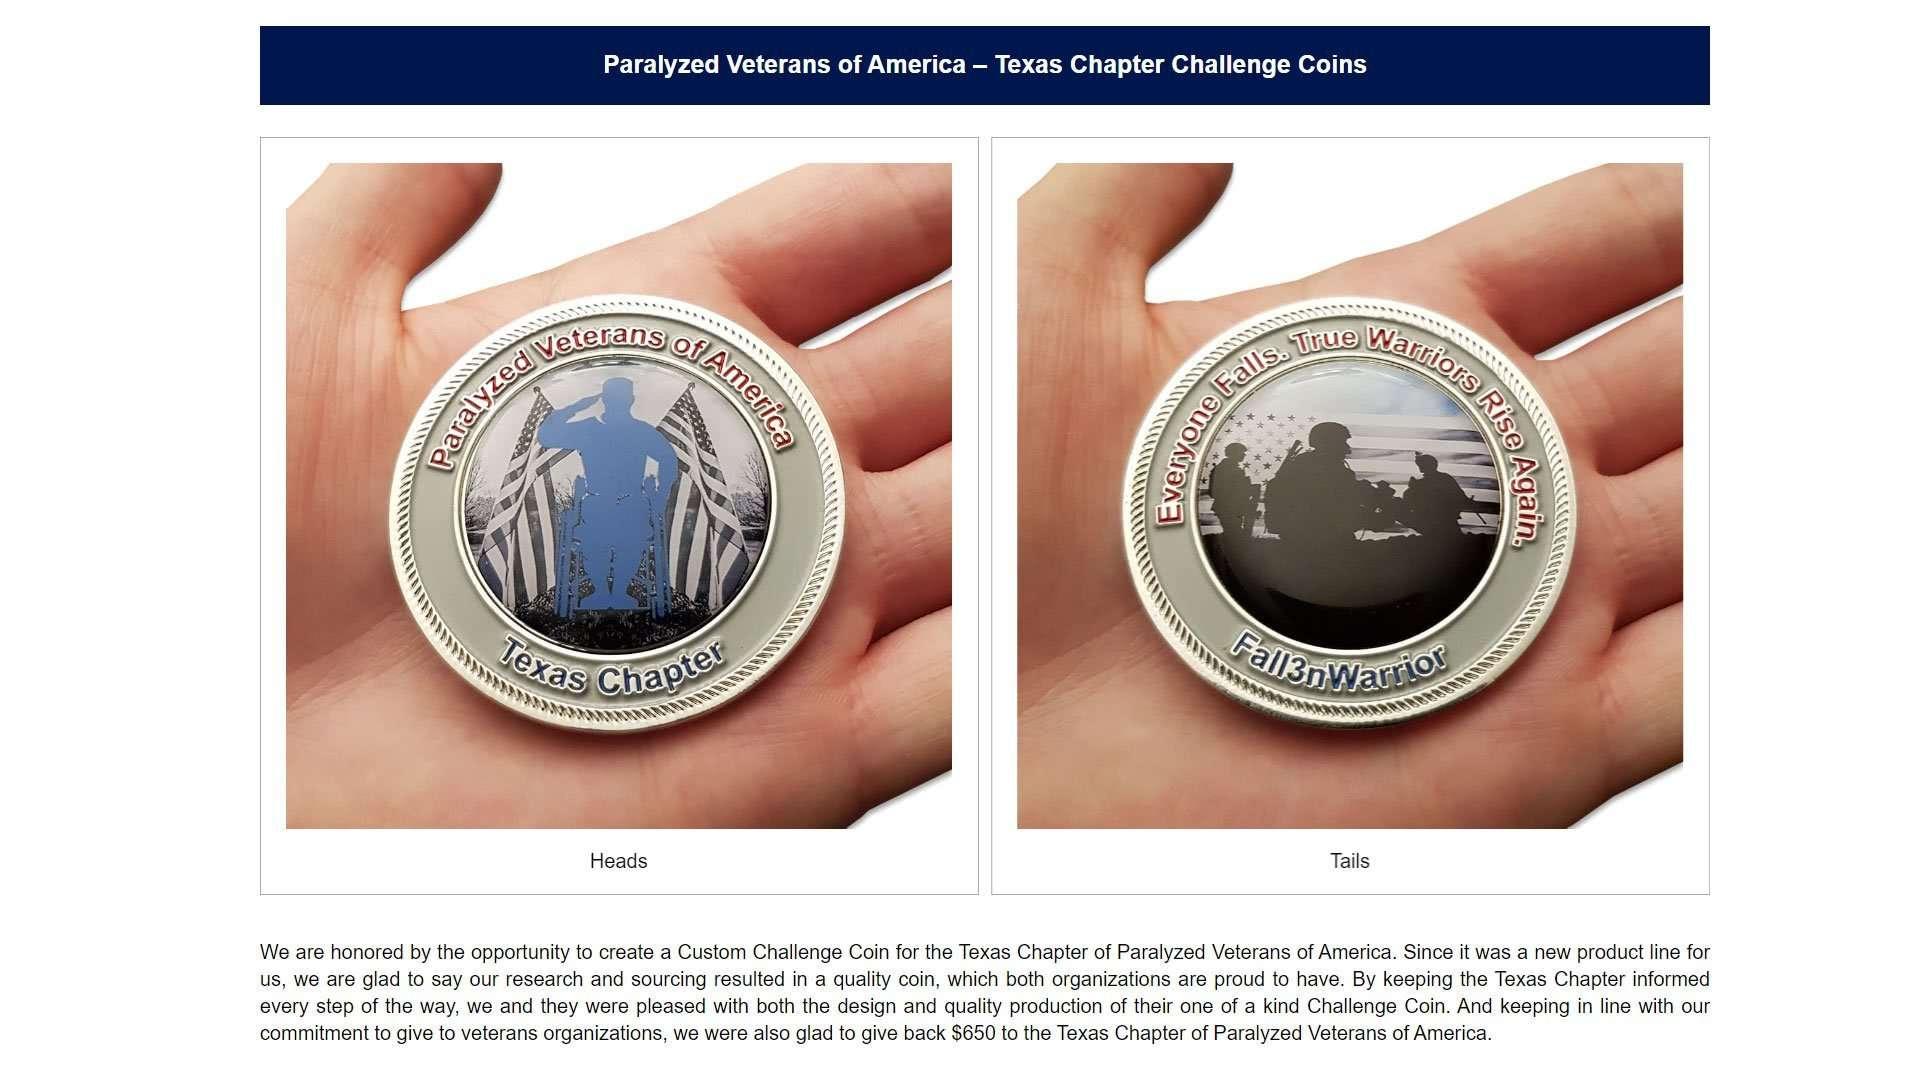 fall3nwarrior-custom-challenge-coins